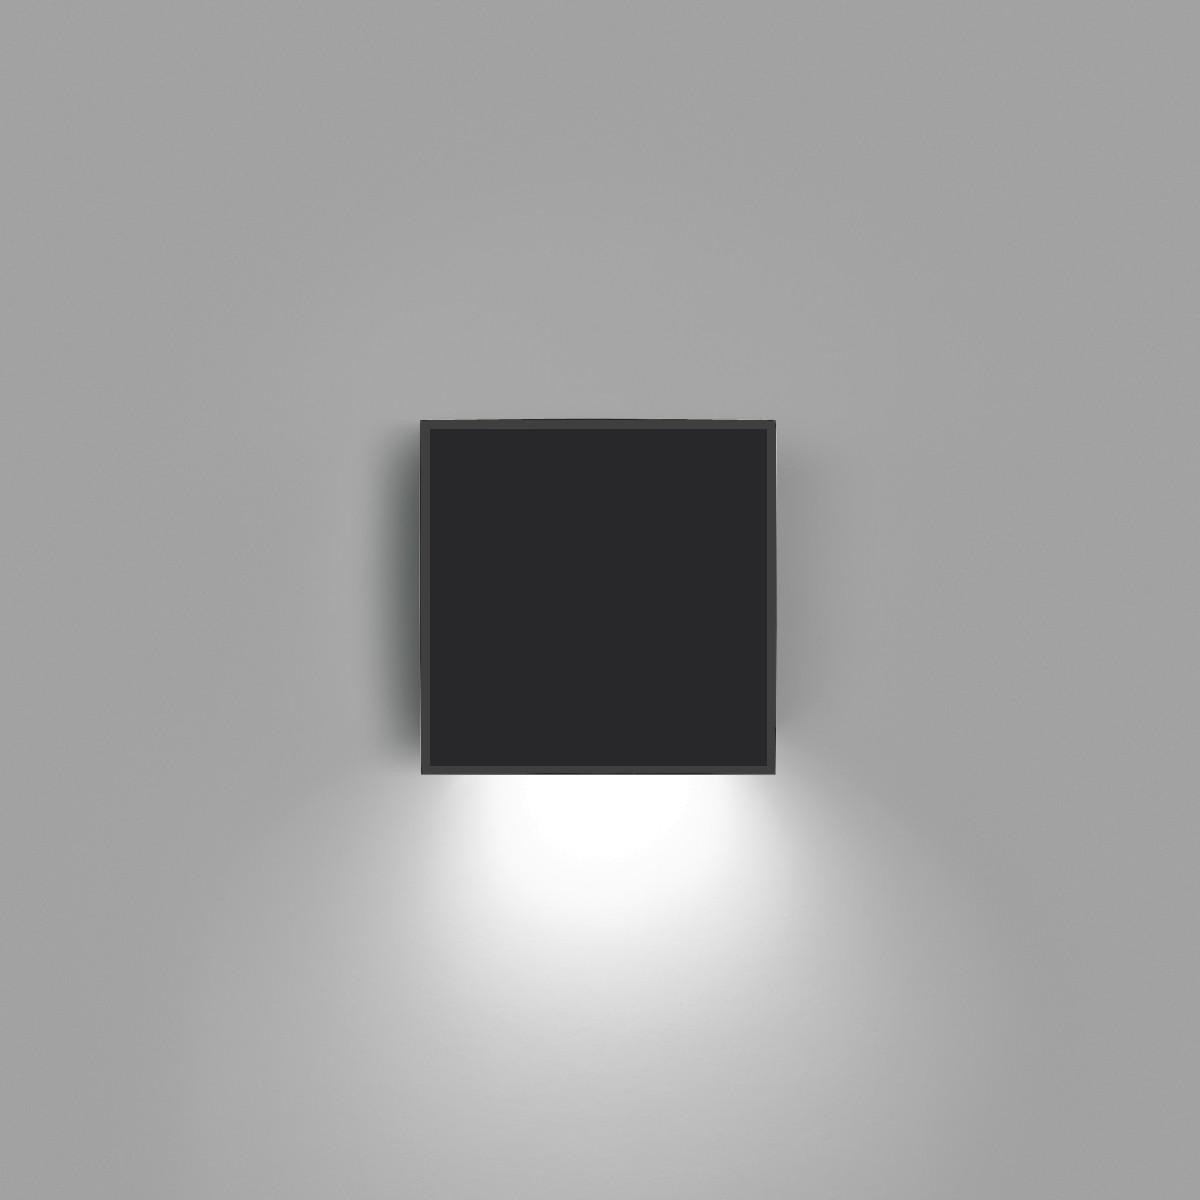 Vibia Alpha 7925 Wandleuchte, graphitgrau matt, Front: schwarz